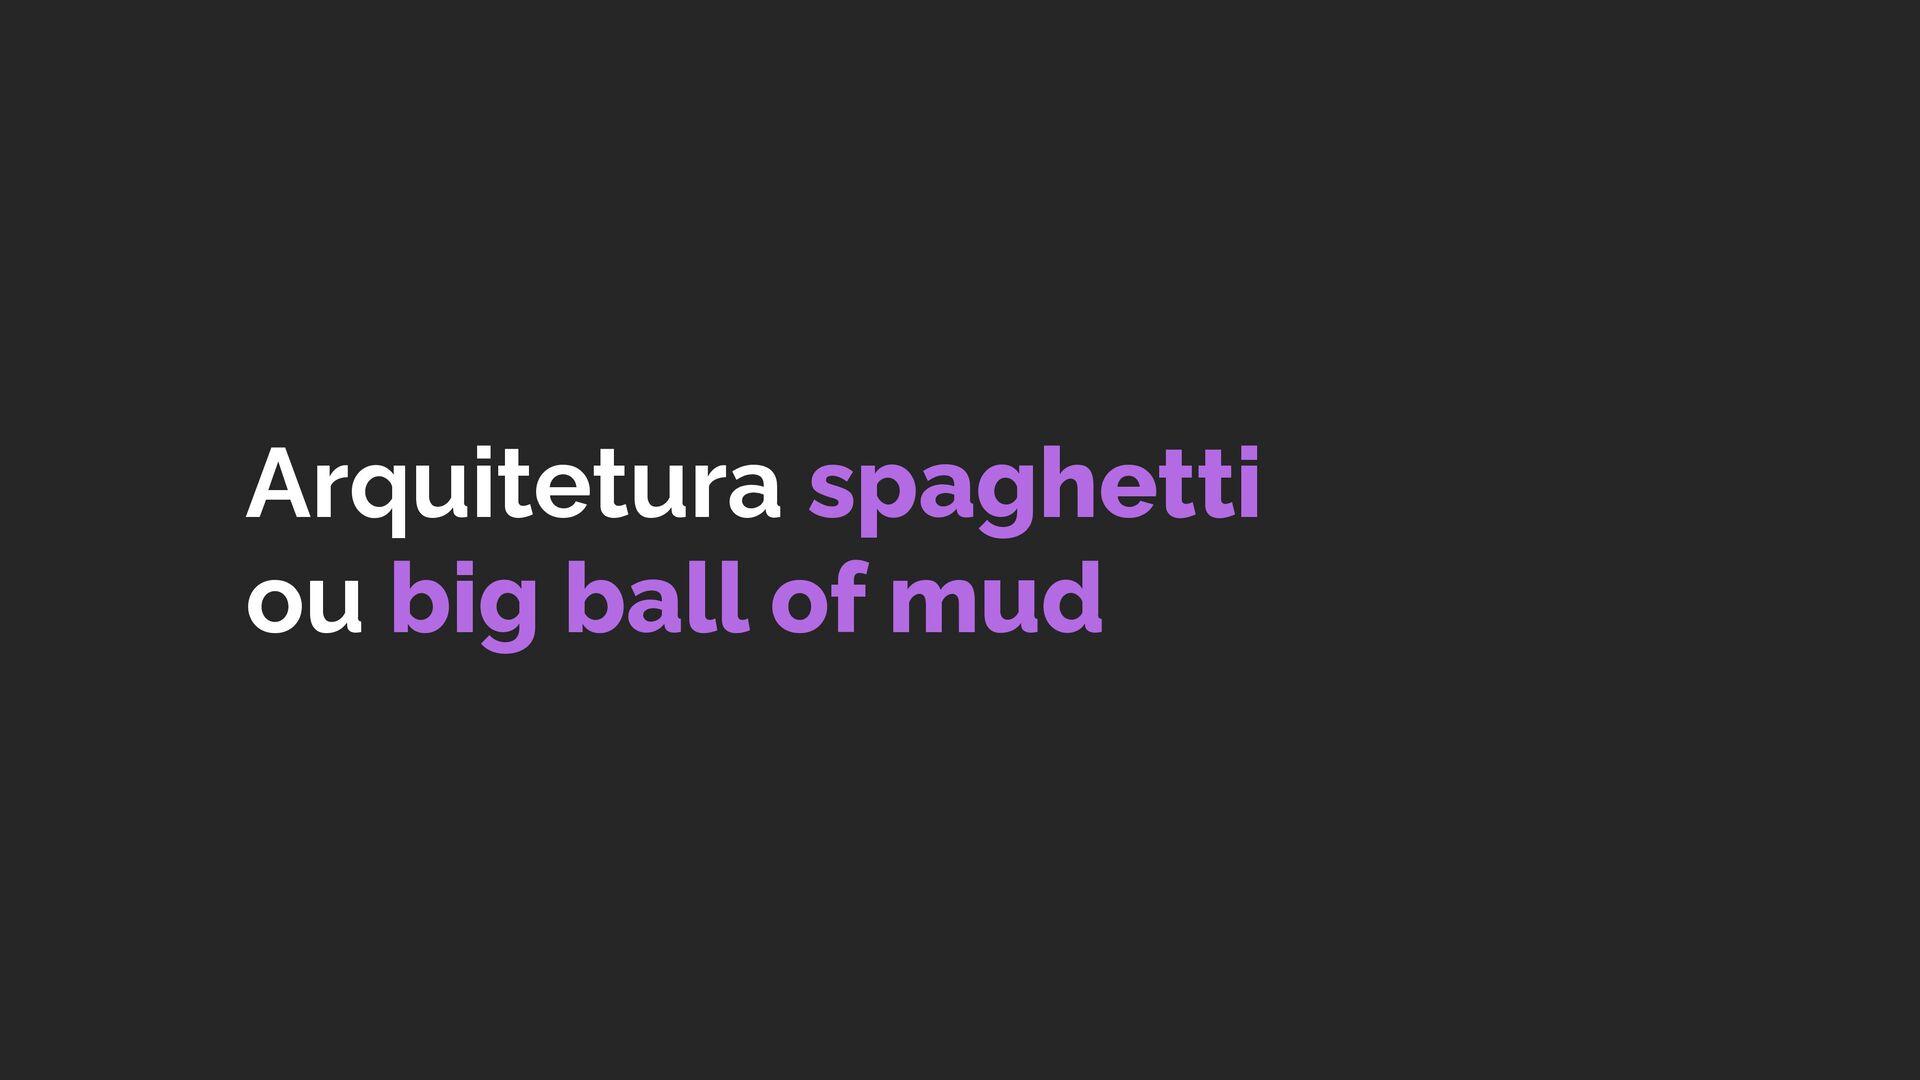 Arquitetura spaghetti ou big ball of mud